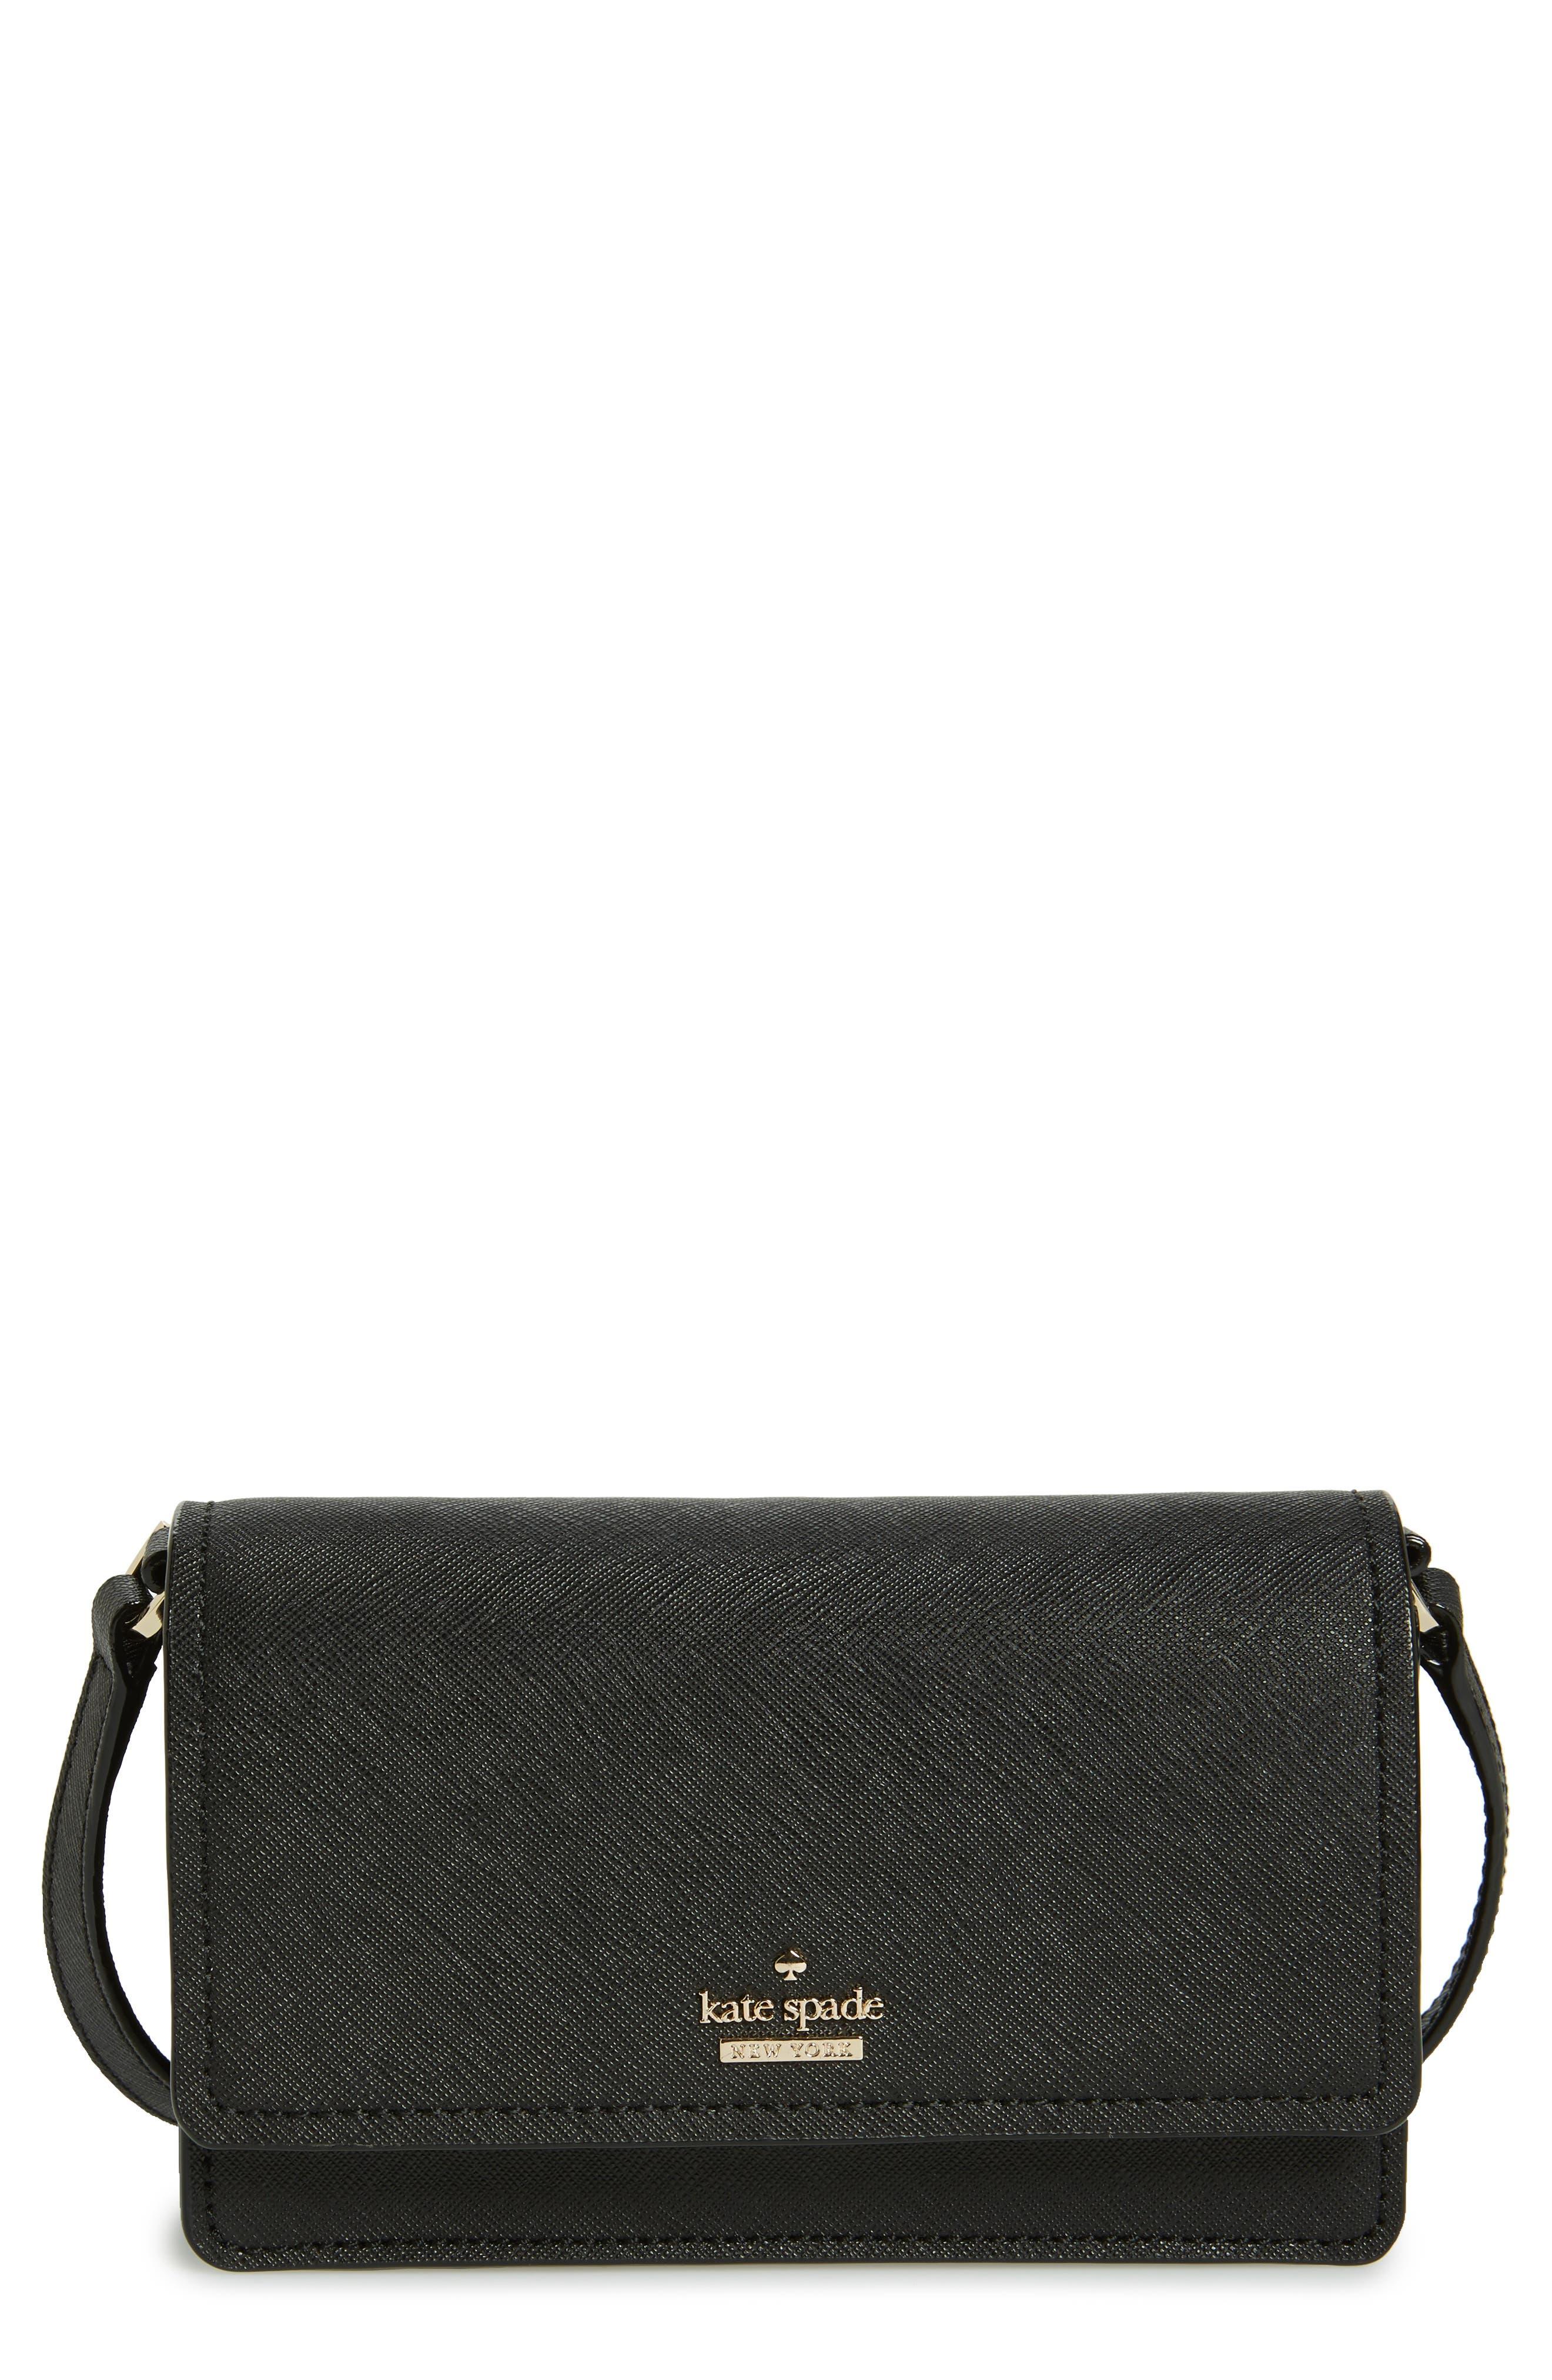 cameron street - arielle crossbody bag, Main, color, 001